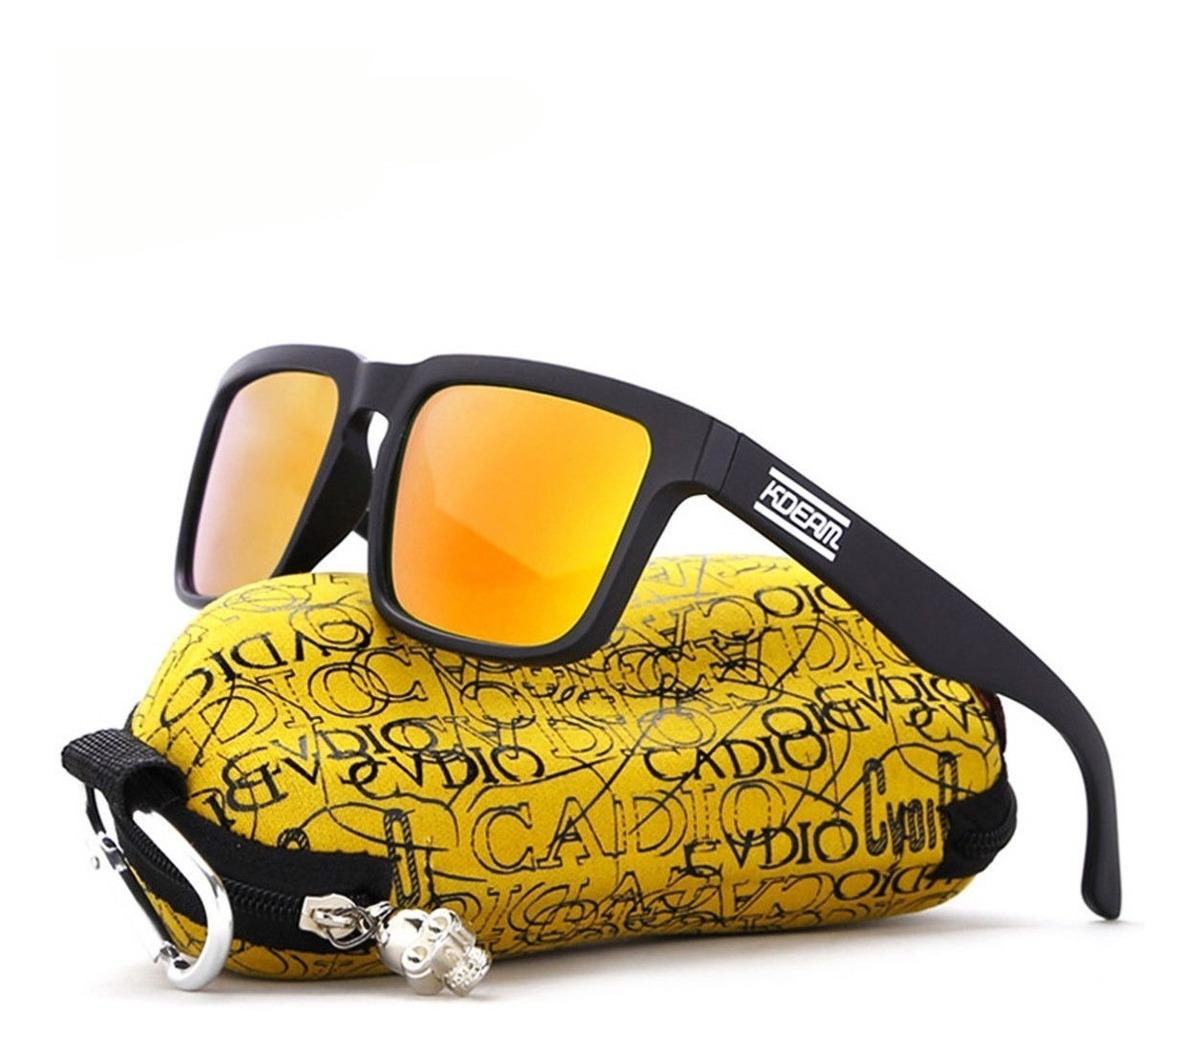 ab4829e2ef gafas de sol polarizadas kdeam kd901p-c10 para hombres gafas. Cargando zoom.